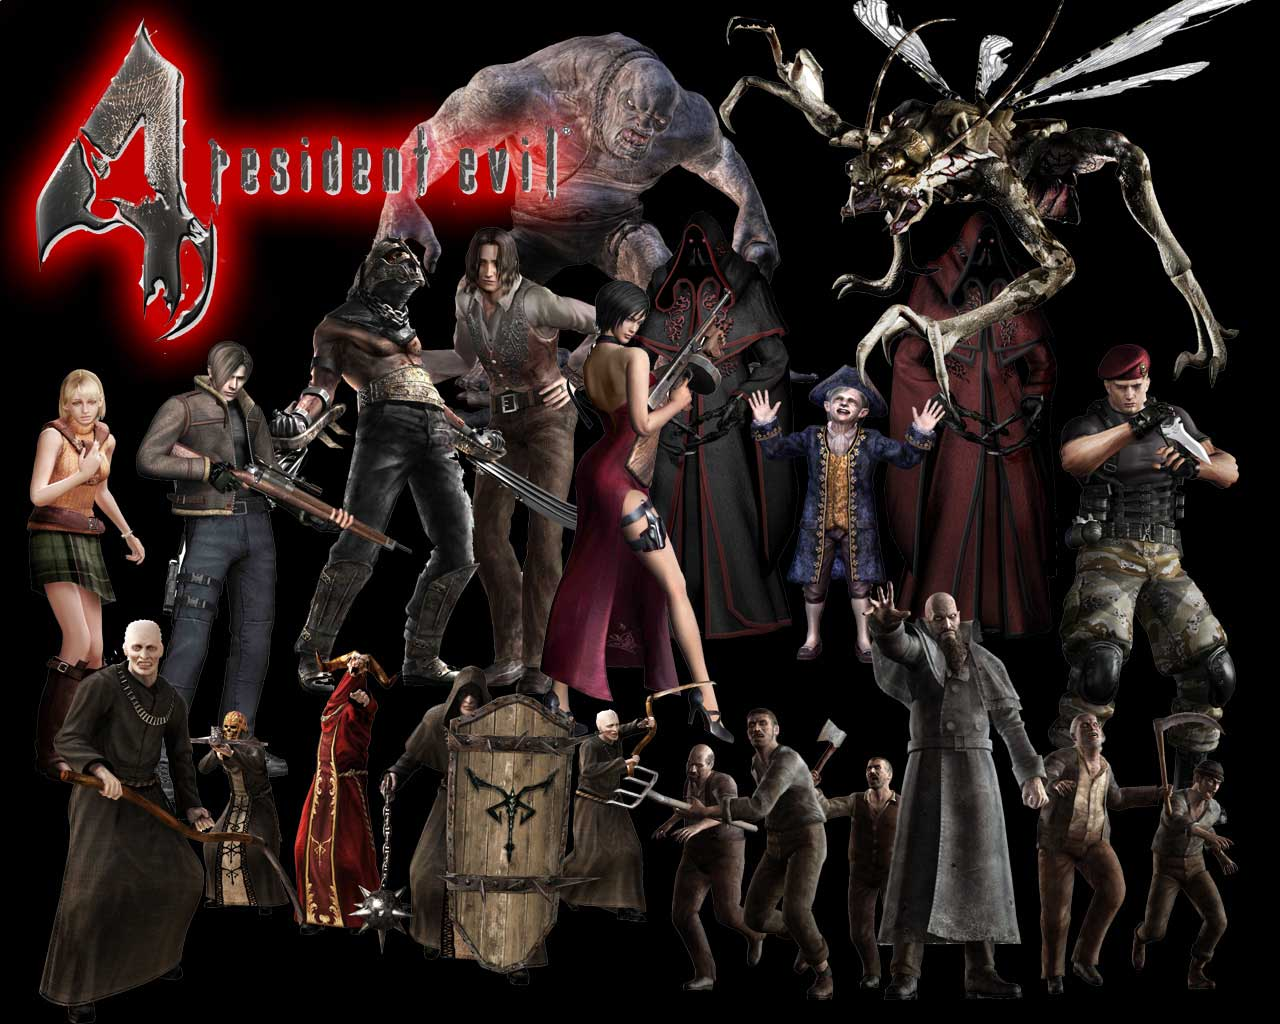 49 ] Resident Evil Wallpapers Free Download On WallpaperSafari